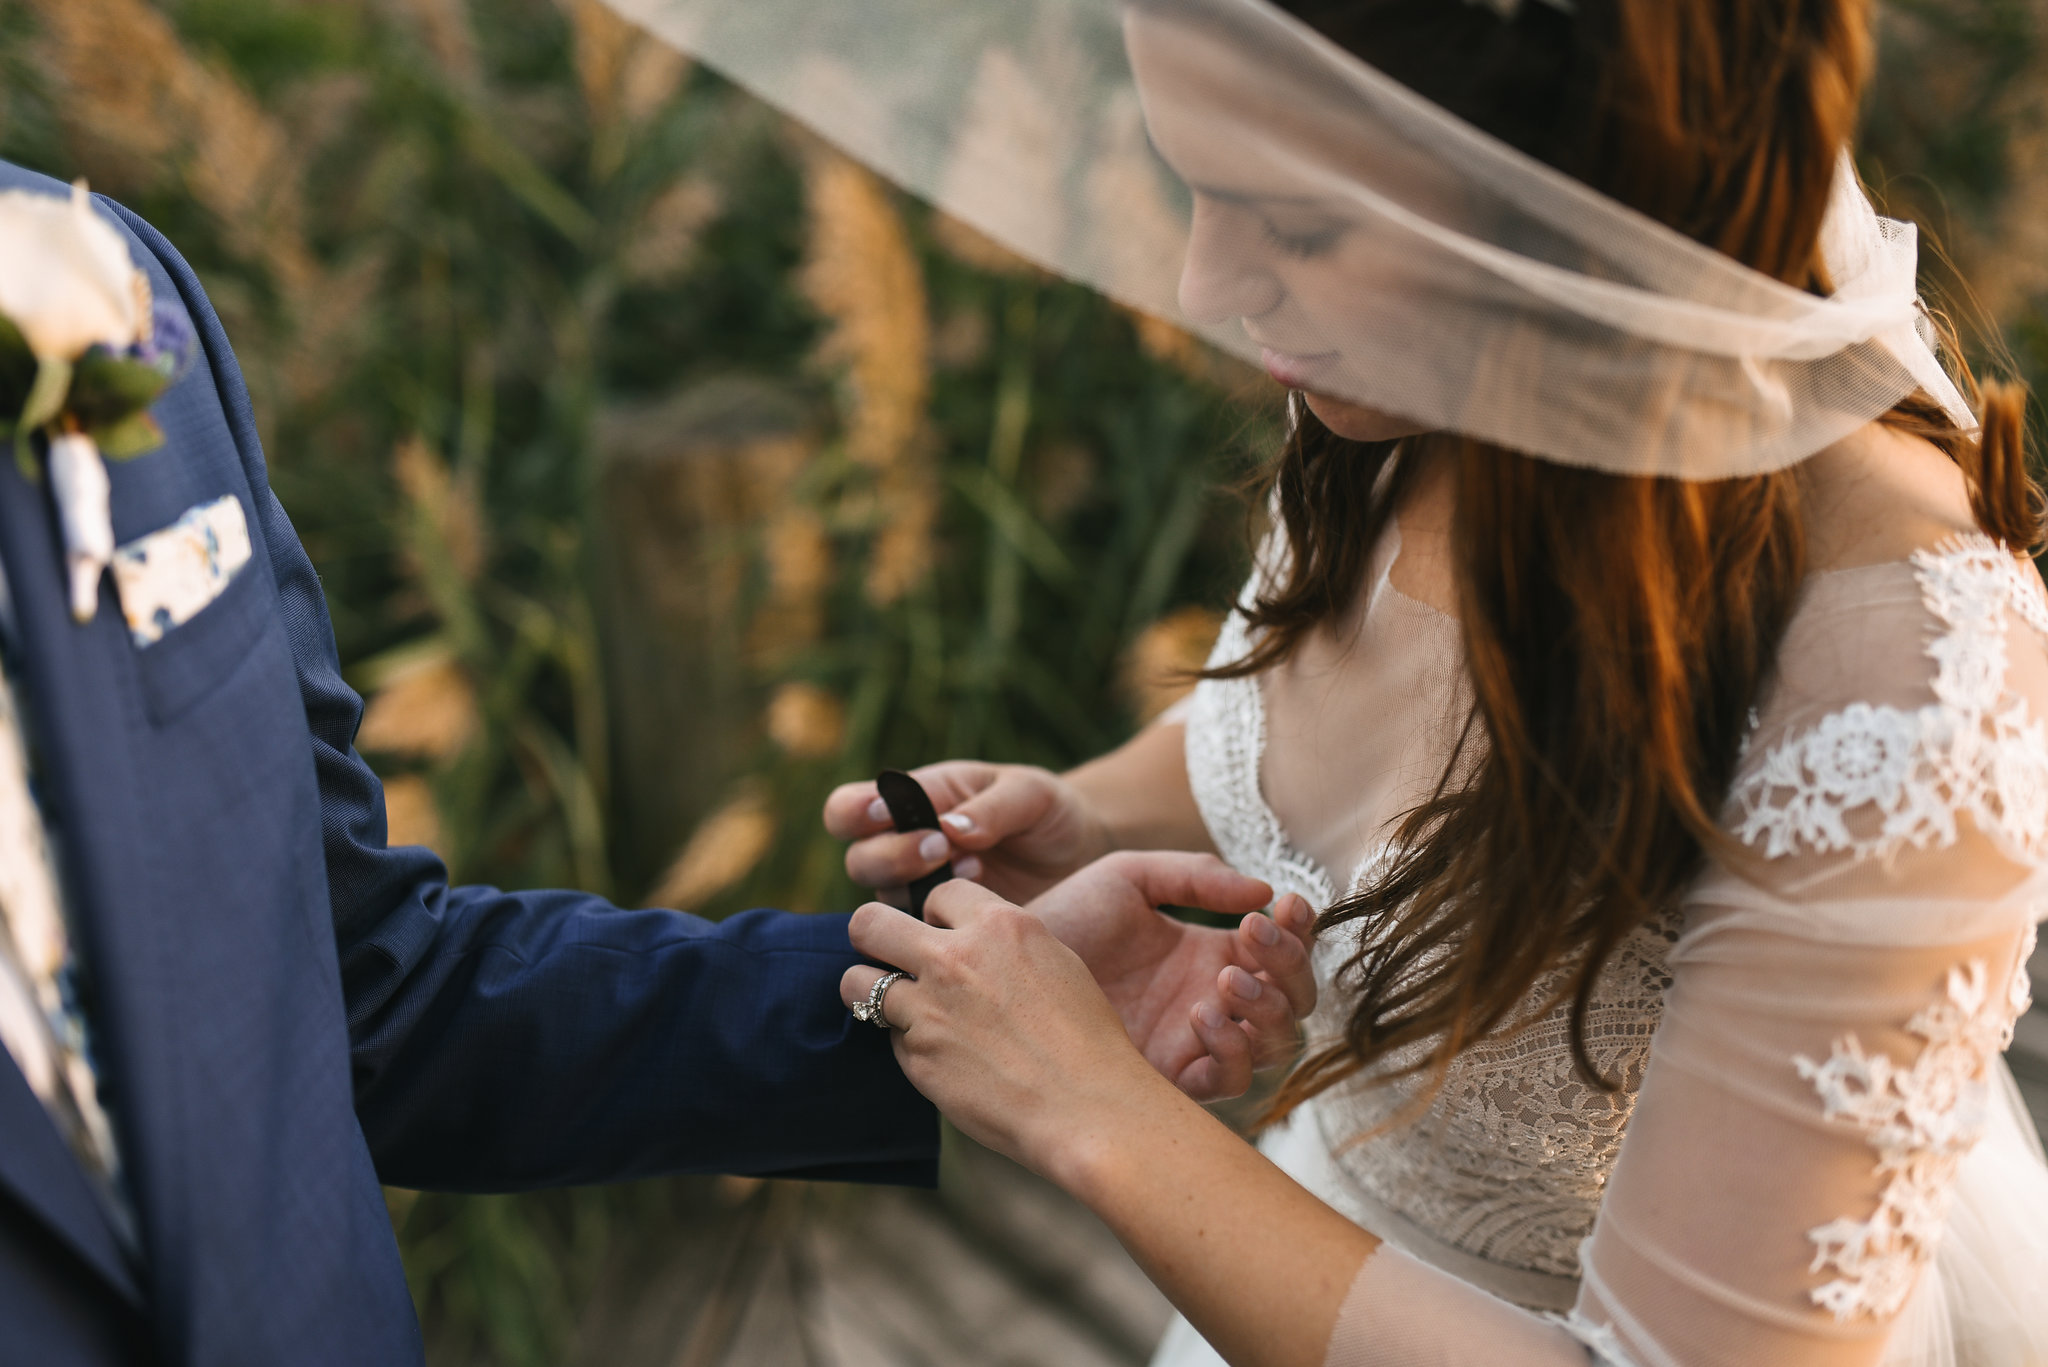 Baltimore, Canton, Church Wedding, Modern, Outdoors, Maryland Wedding Photographer, Romantic, Classic, Lace Wedding Dress, Bride helping groom put on watch